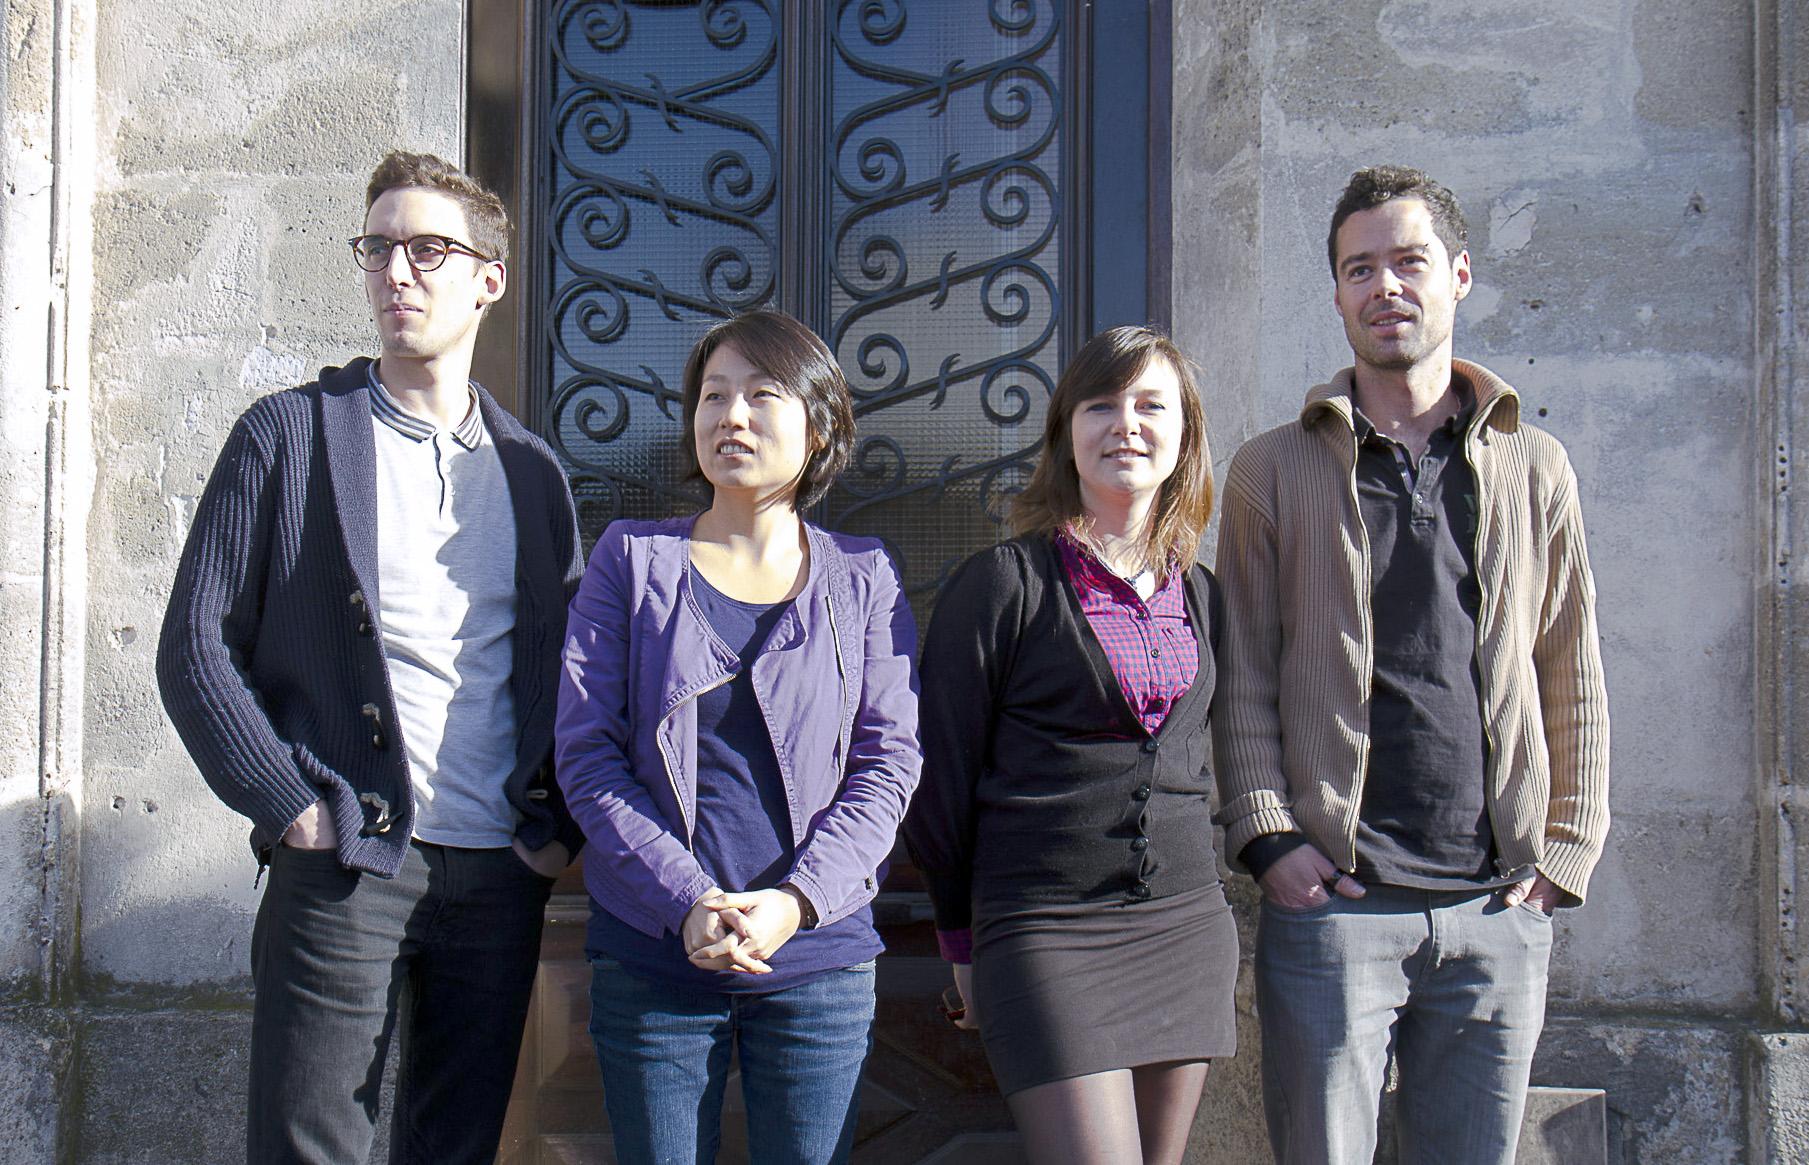 La Feppia (Antoine Thomas, Sooyoung Pajot, Eléonore Dubois et Thomas Demaere) - (c) Pierre Lansac